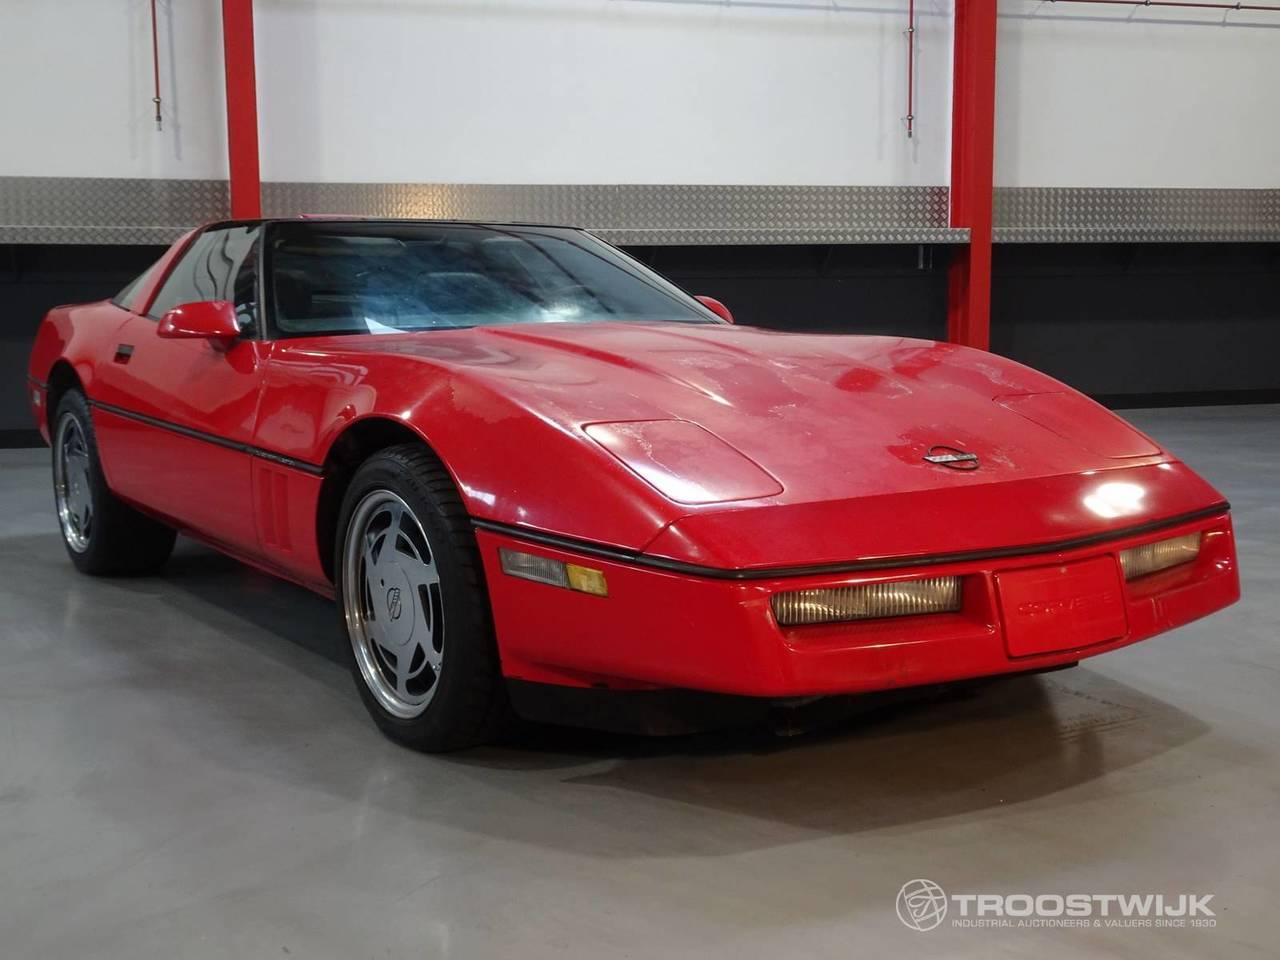 Kelebihan Chevrolet Corvette C4 Review